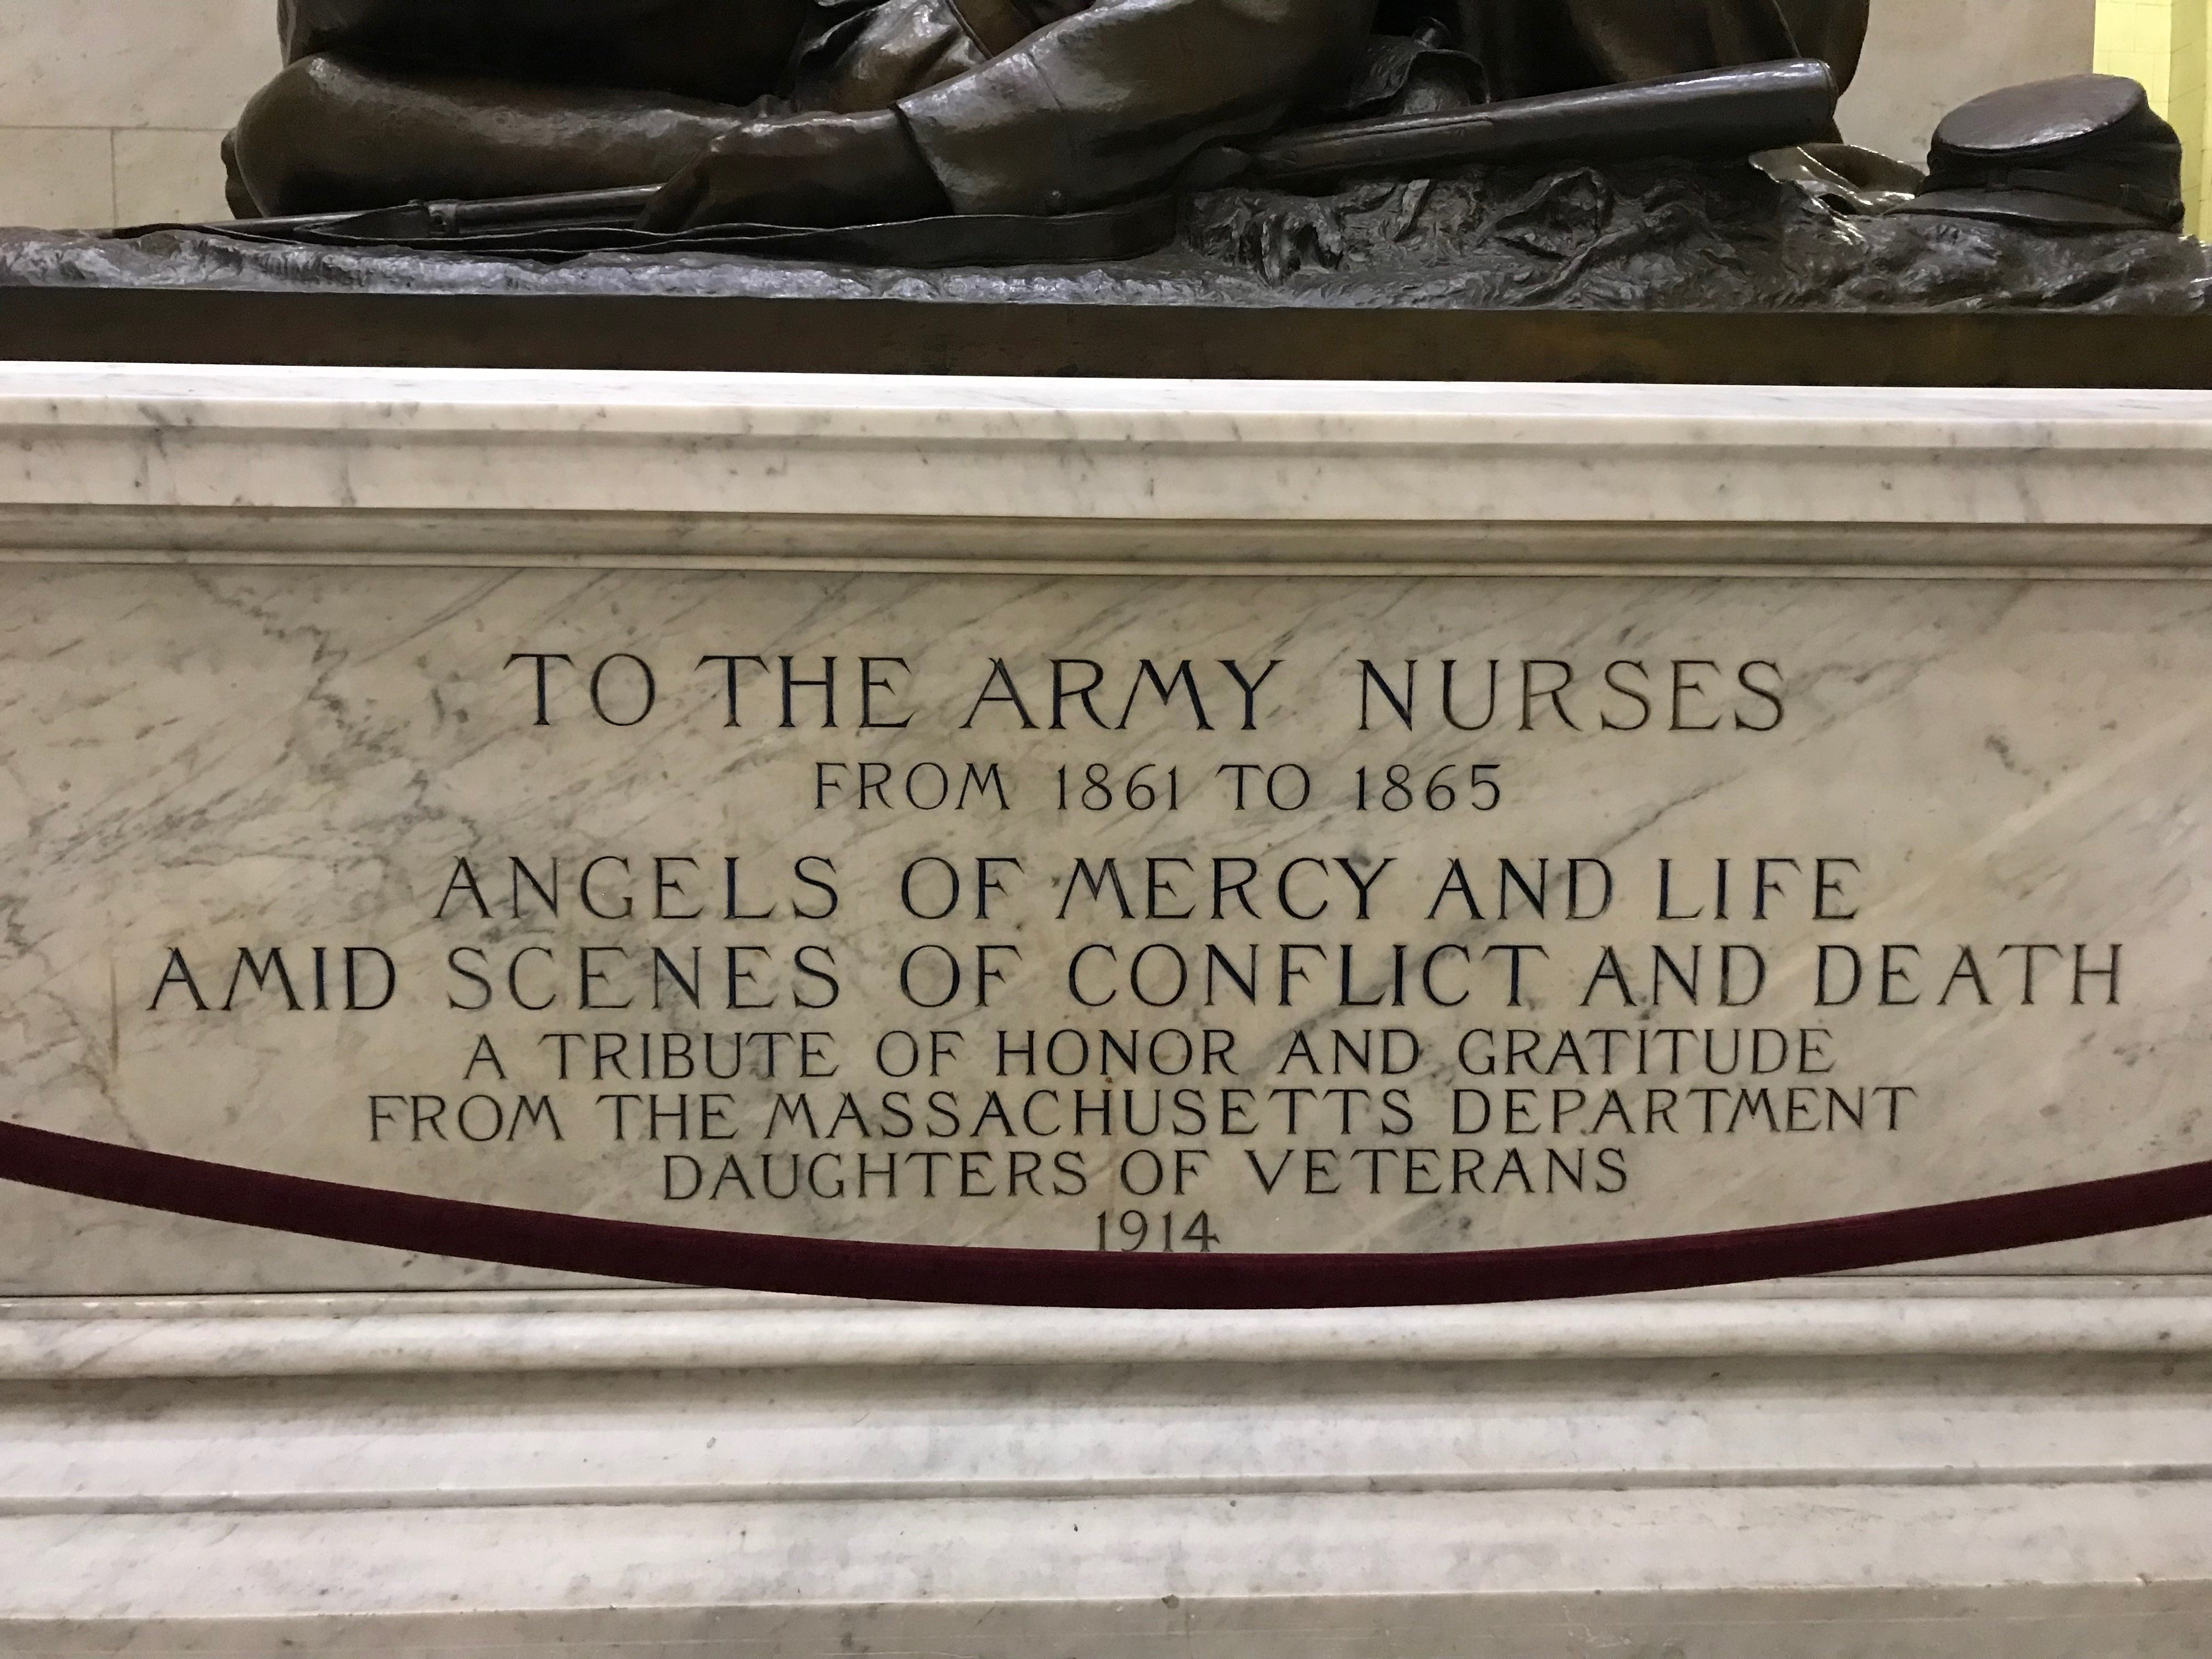 Civil War Army Nurses Memorial Plaque by Bela Lyon Pratt Photography by Edda Kirsch